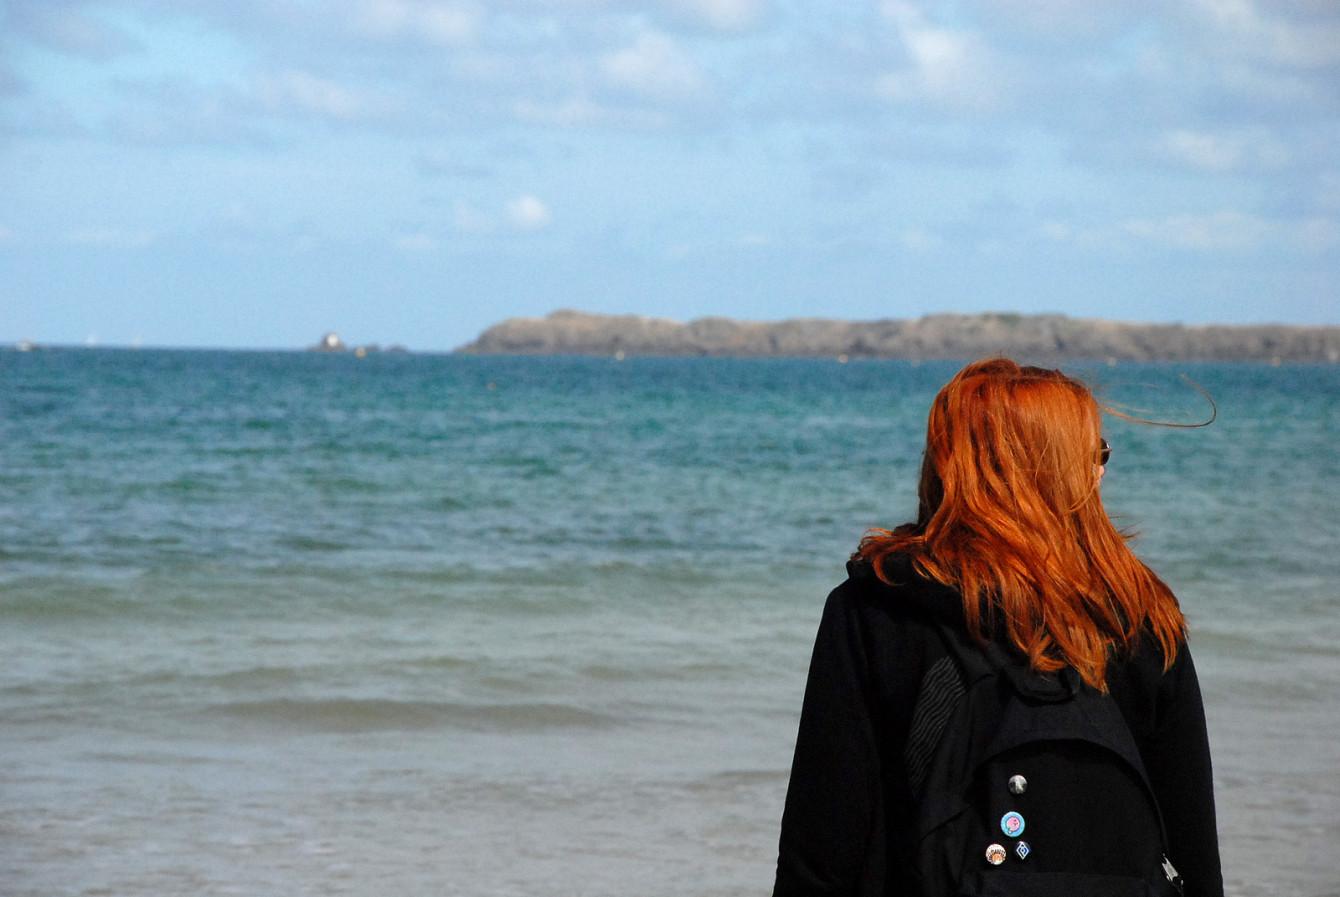 Tête-à-tête avec la mer